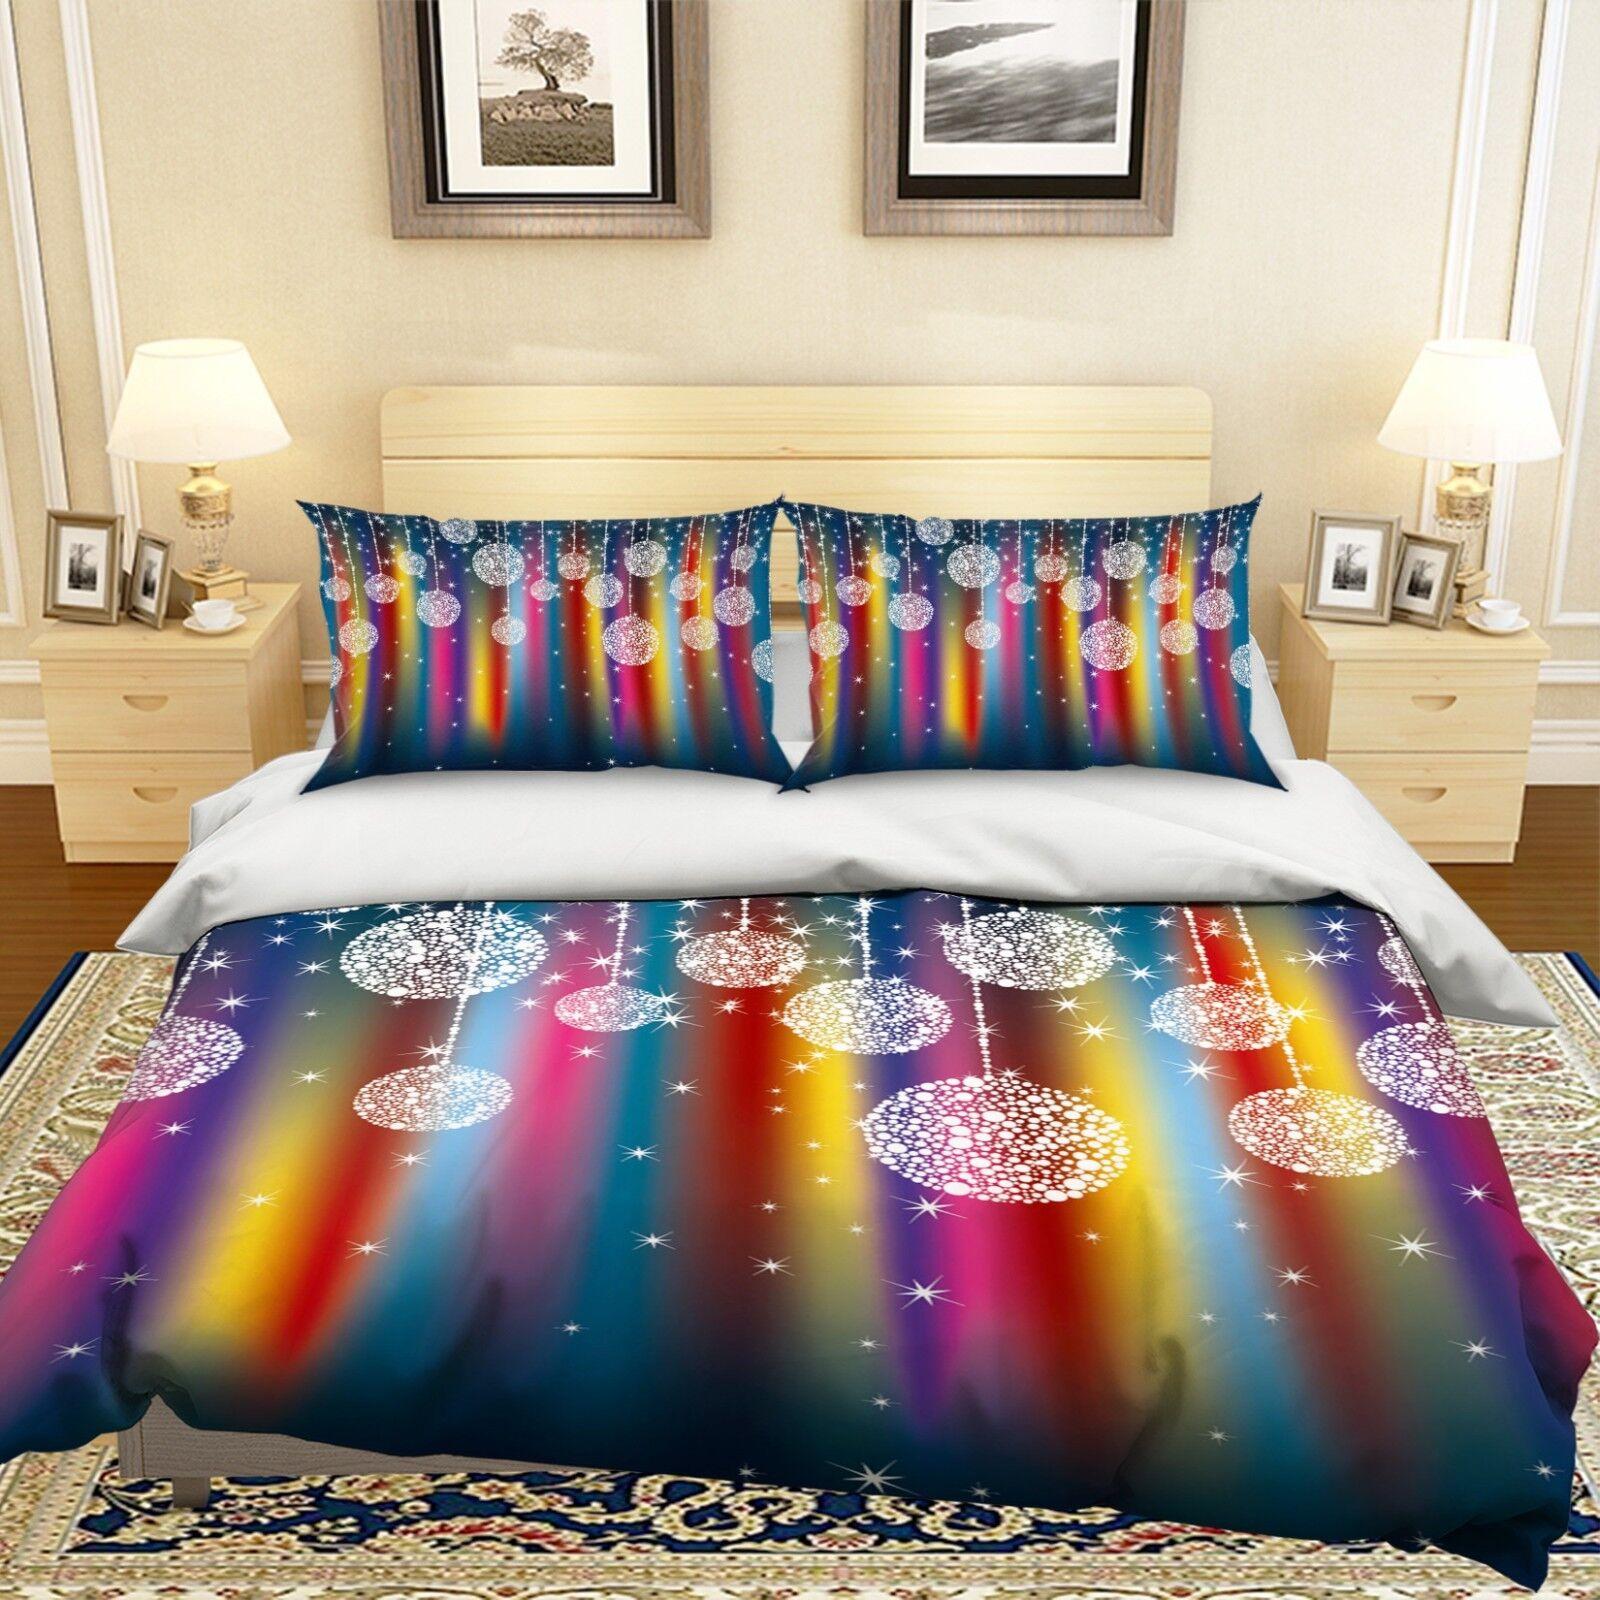 3D Christmas Xmas 505 Bed Pillowcases Quilt Duvet Cover Set Single Queen King AU